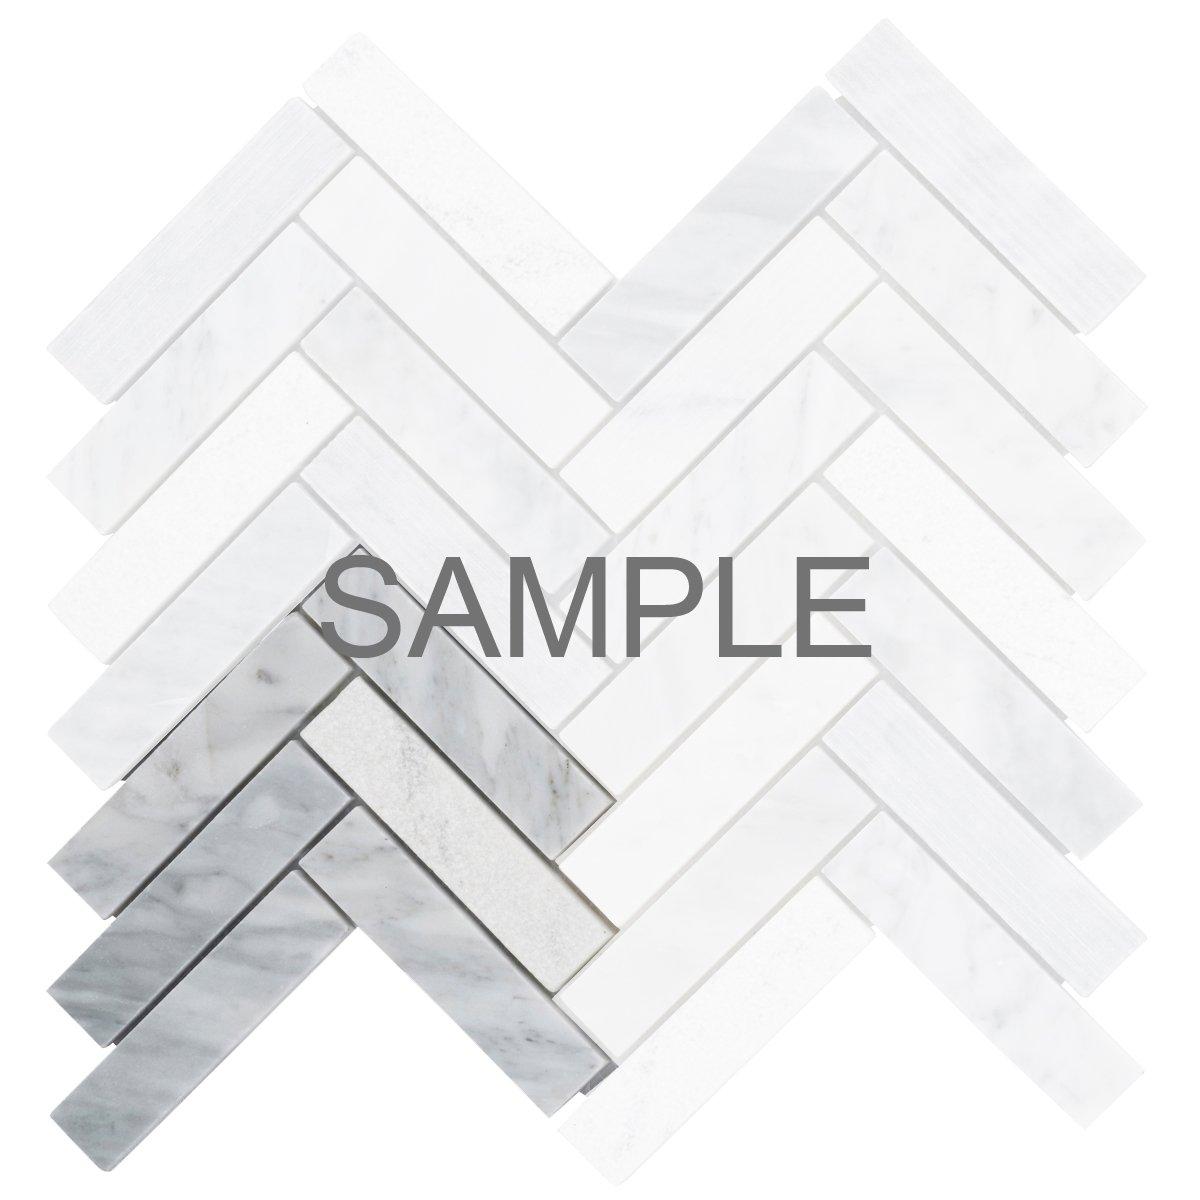 Modket TDH72MO-S Sample Cream Beige Crystal Glass Mosaic Tile Matte Blended Herringbone Pattern Backsplash Metallic Cold Spray